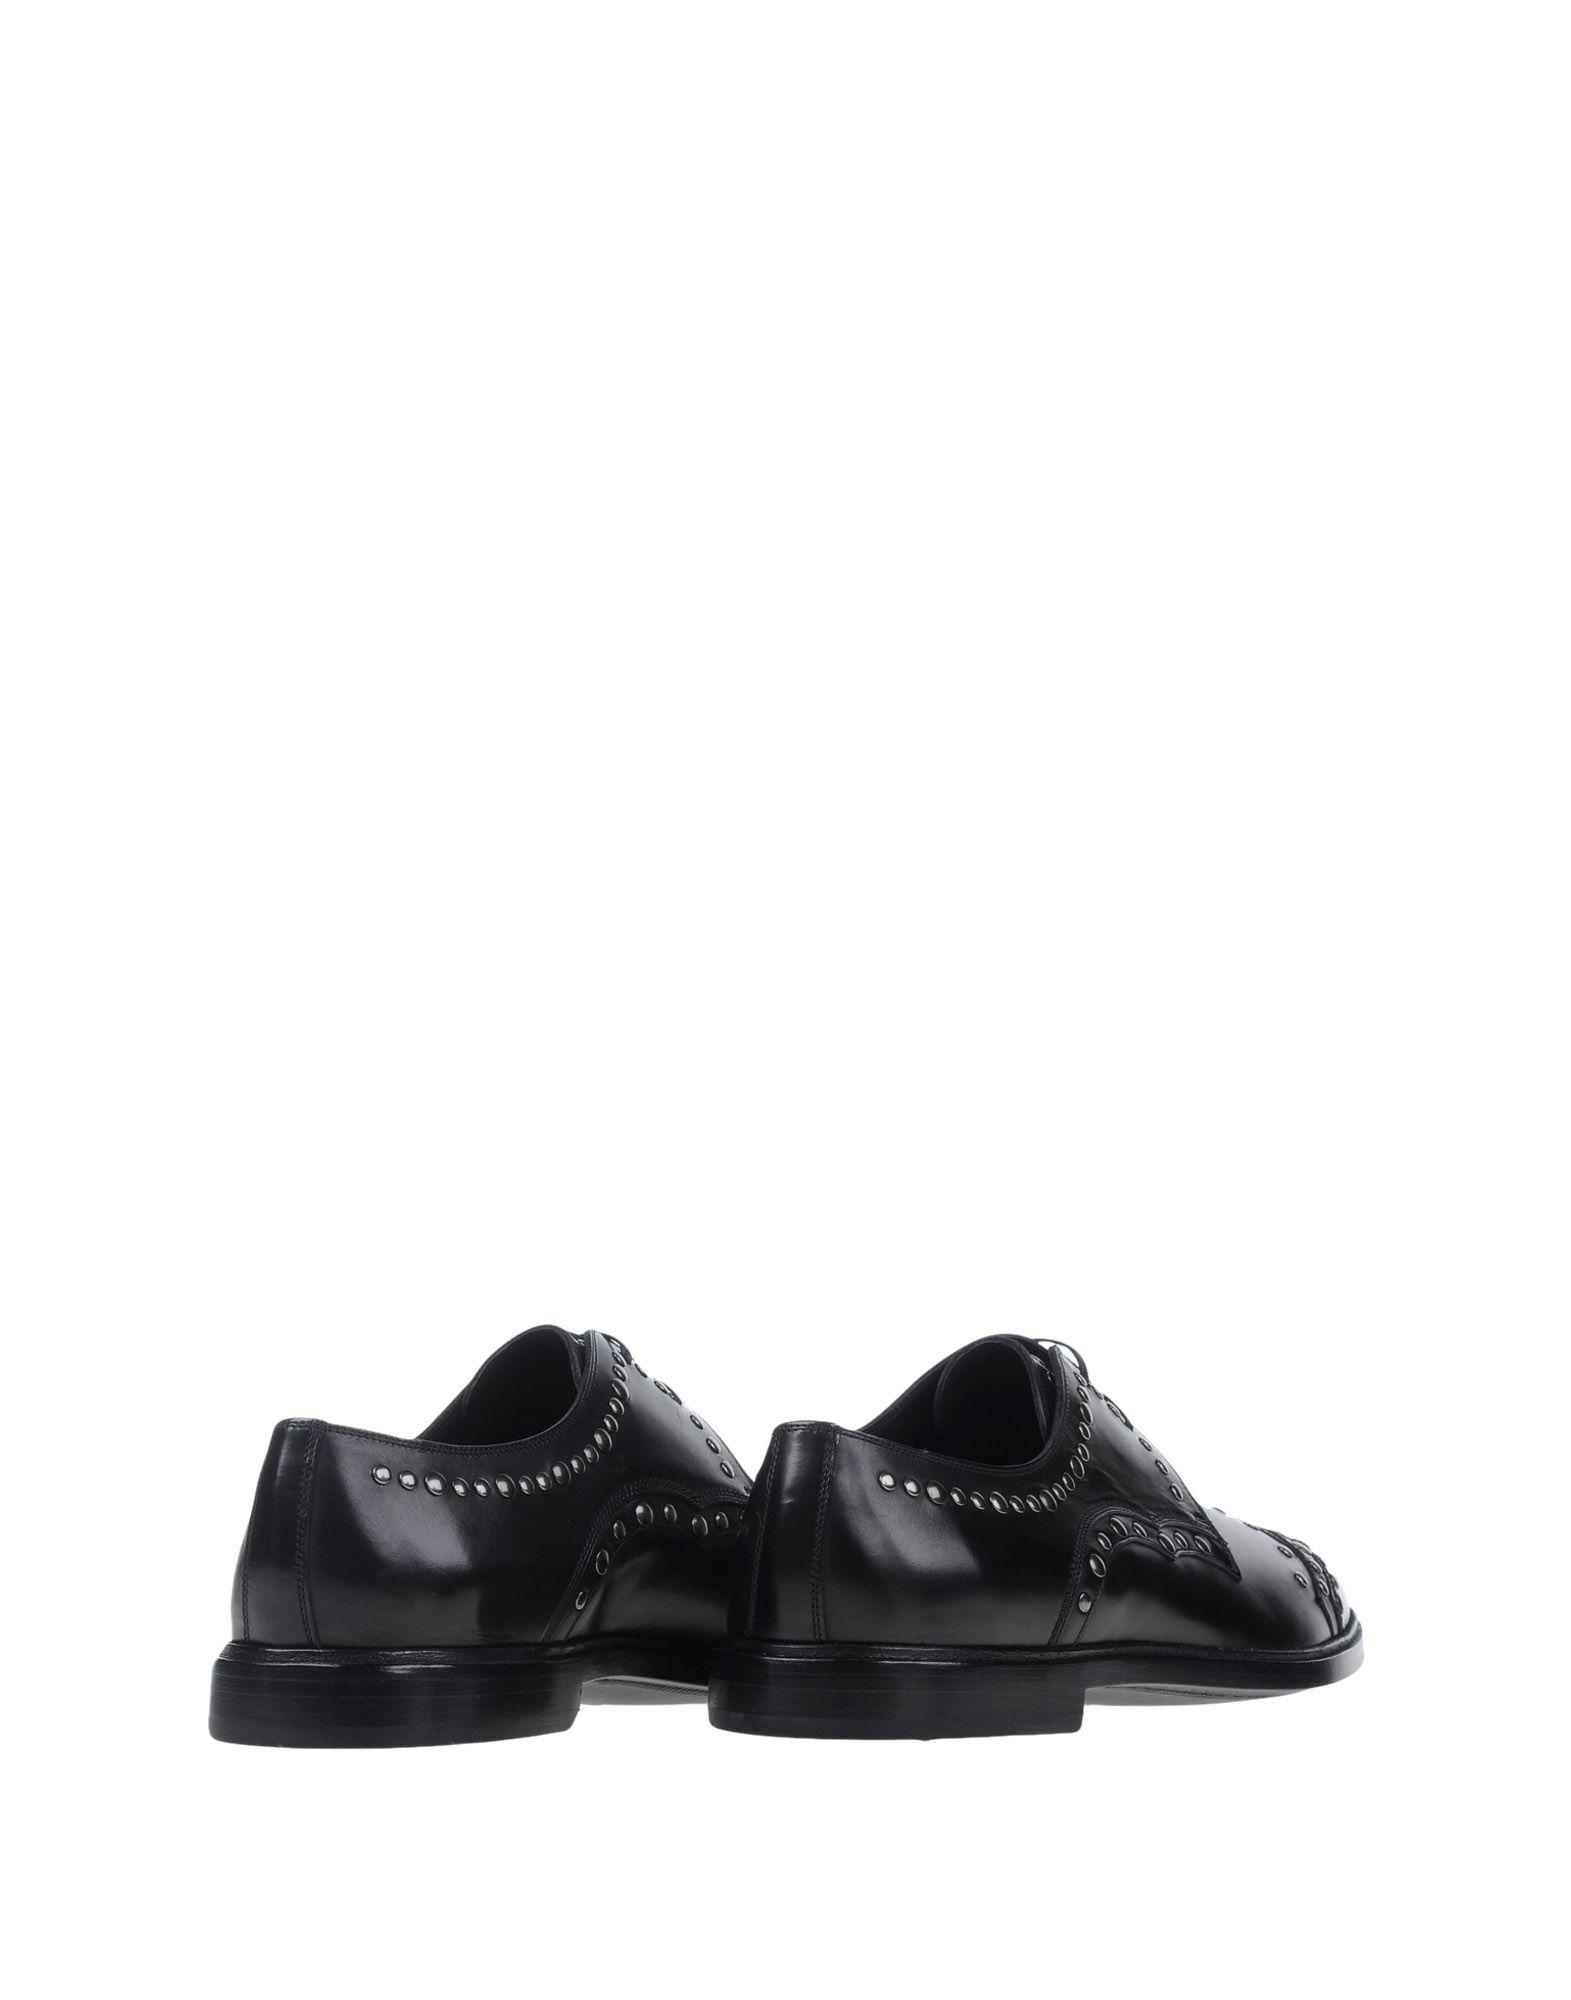 Dolce & Gabbana Schnürschuhe Herren  11059177JF Gute Qualität beliebte beliebte beliebte Schuhe 5e9248